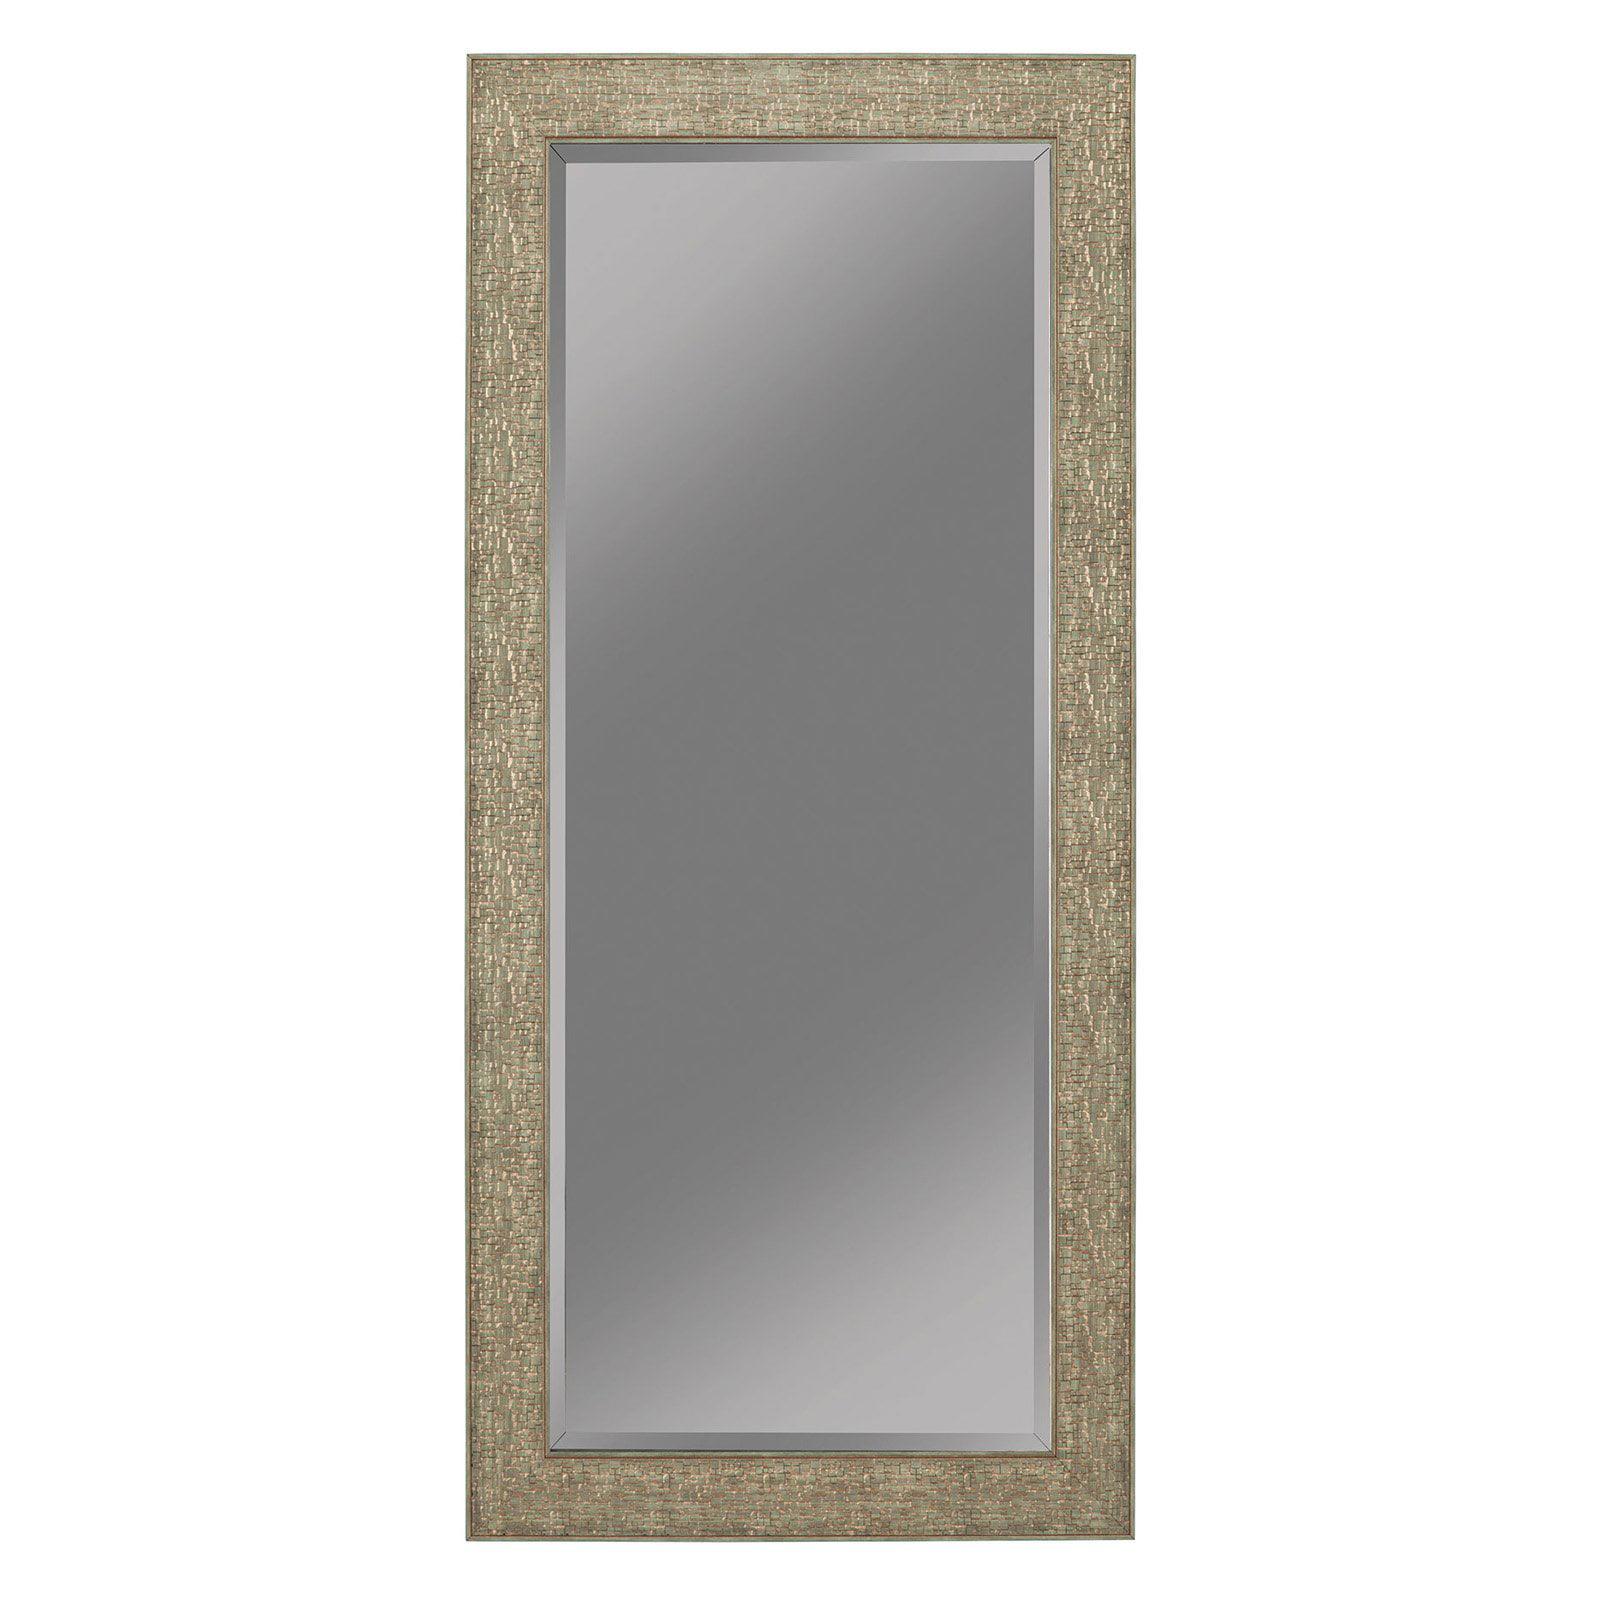 Coaster Furniture Framed Wall Mirror - 32W x 66H in.